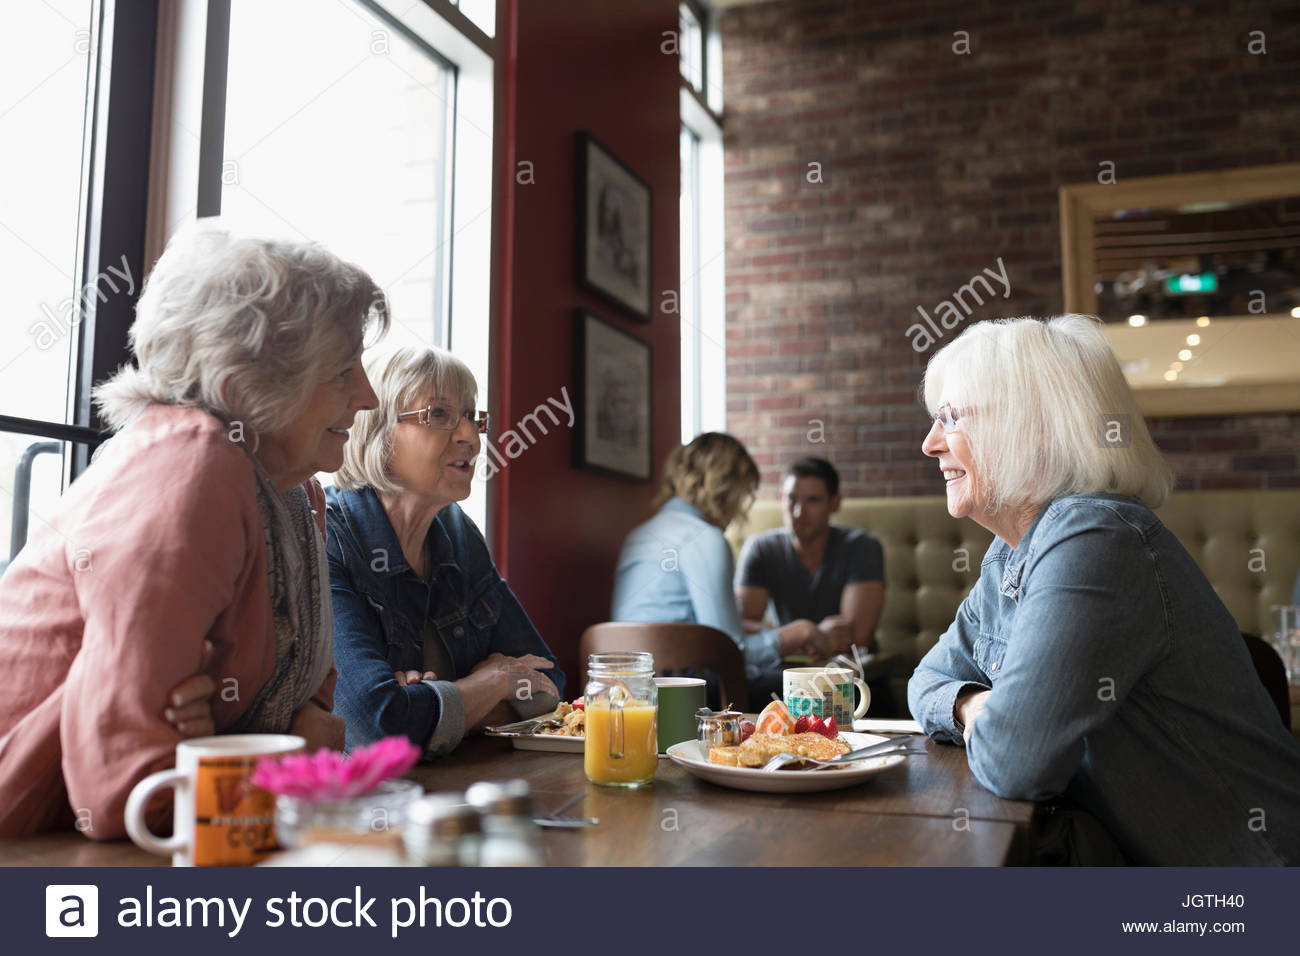 Senior women talking, eating brunch at diner table - Stock Image